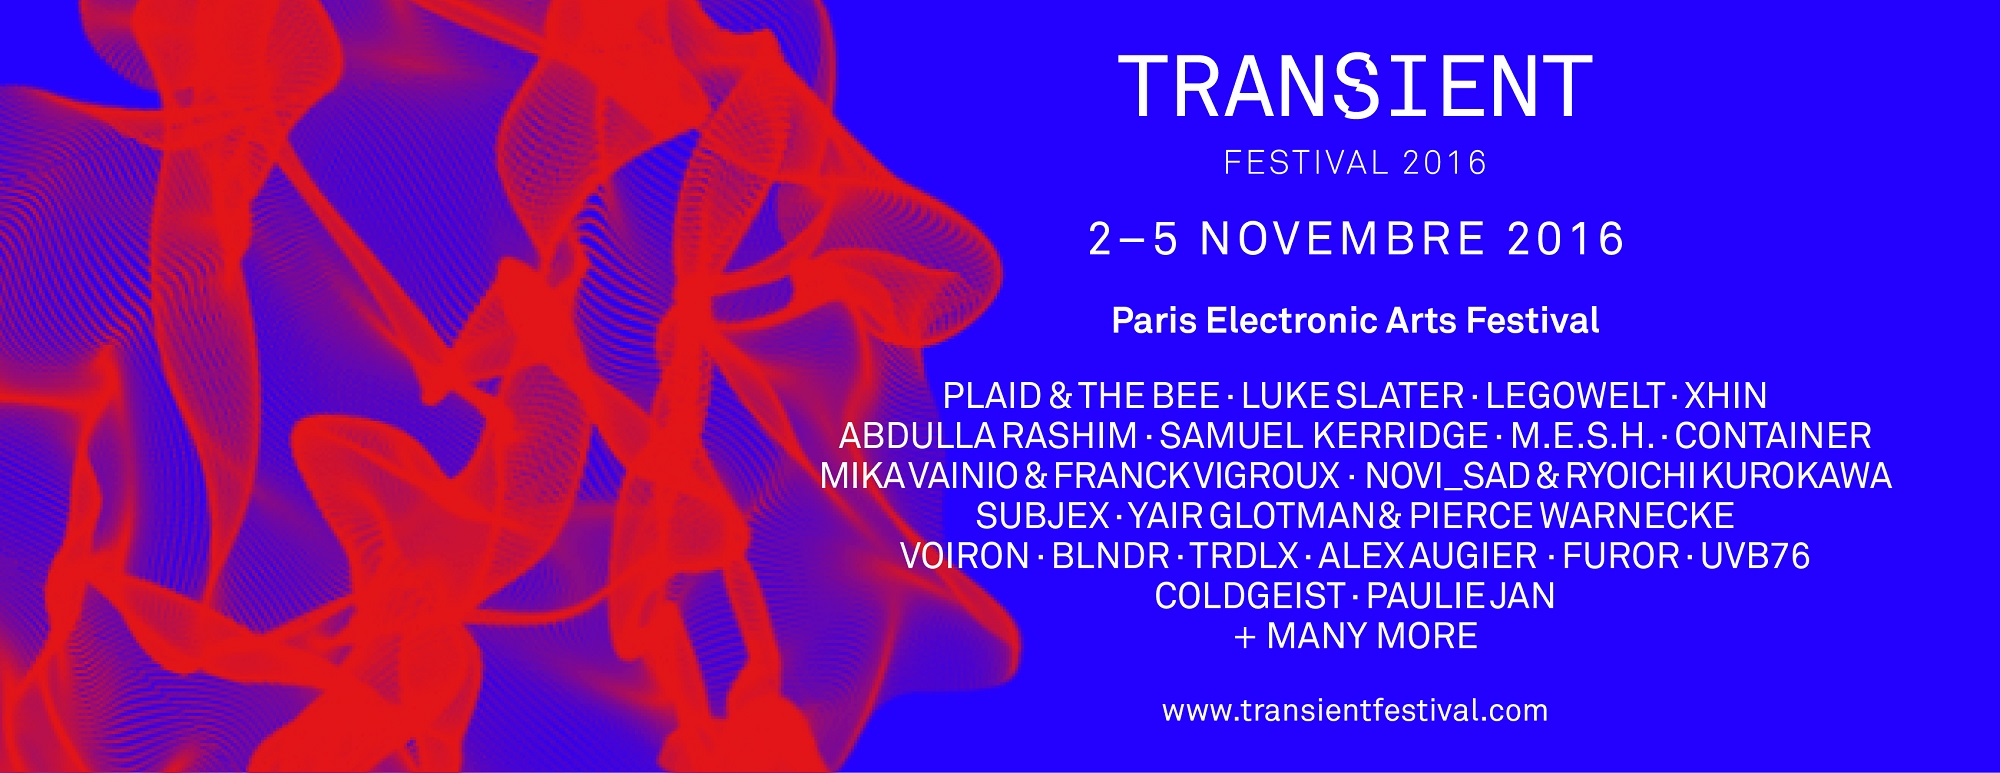 transient festival modzik